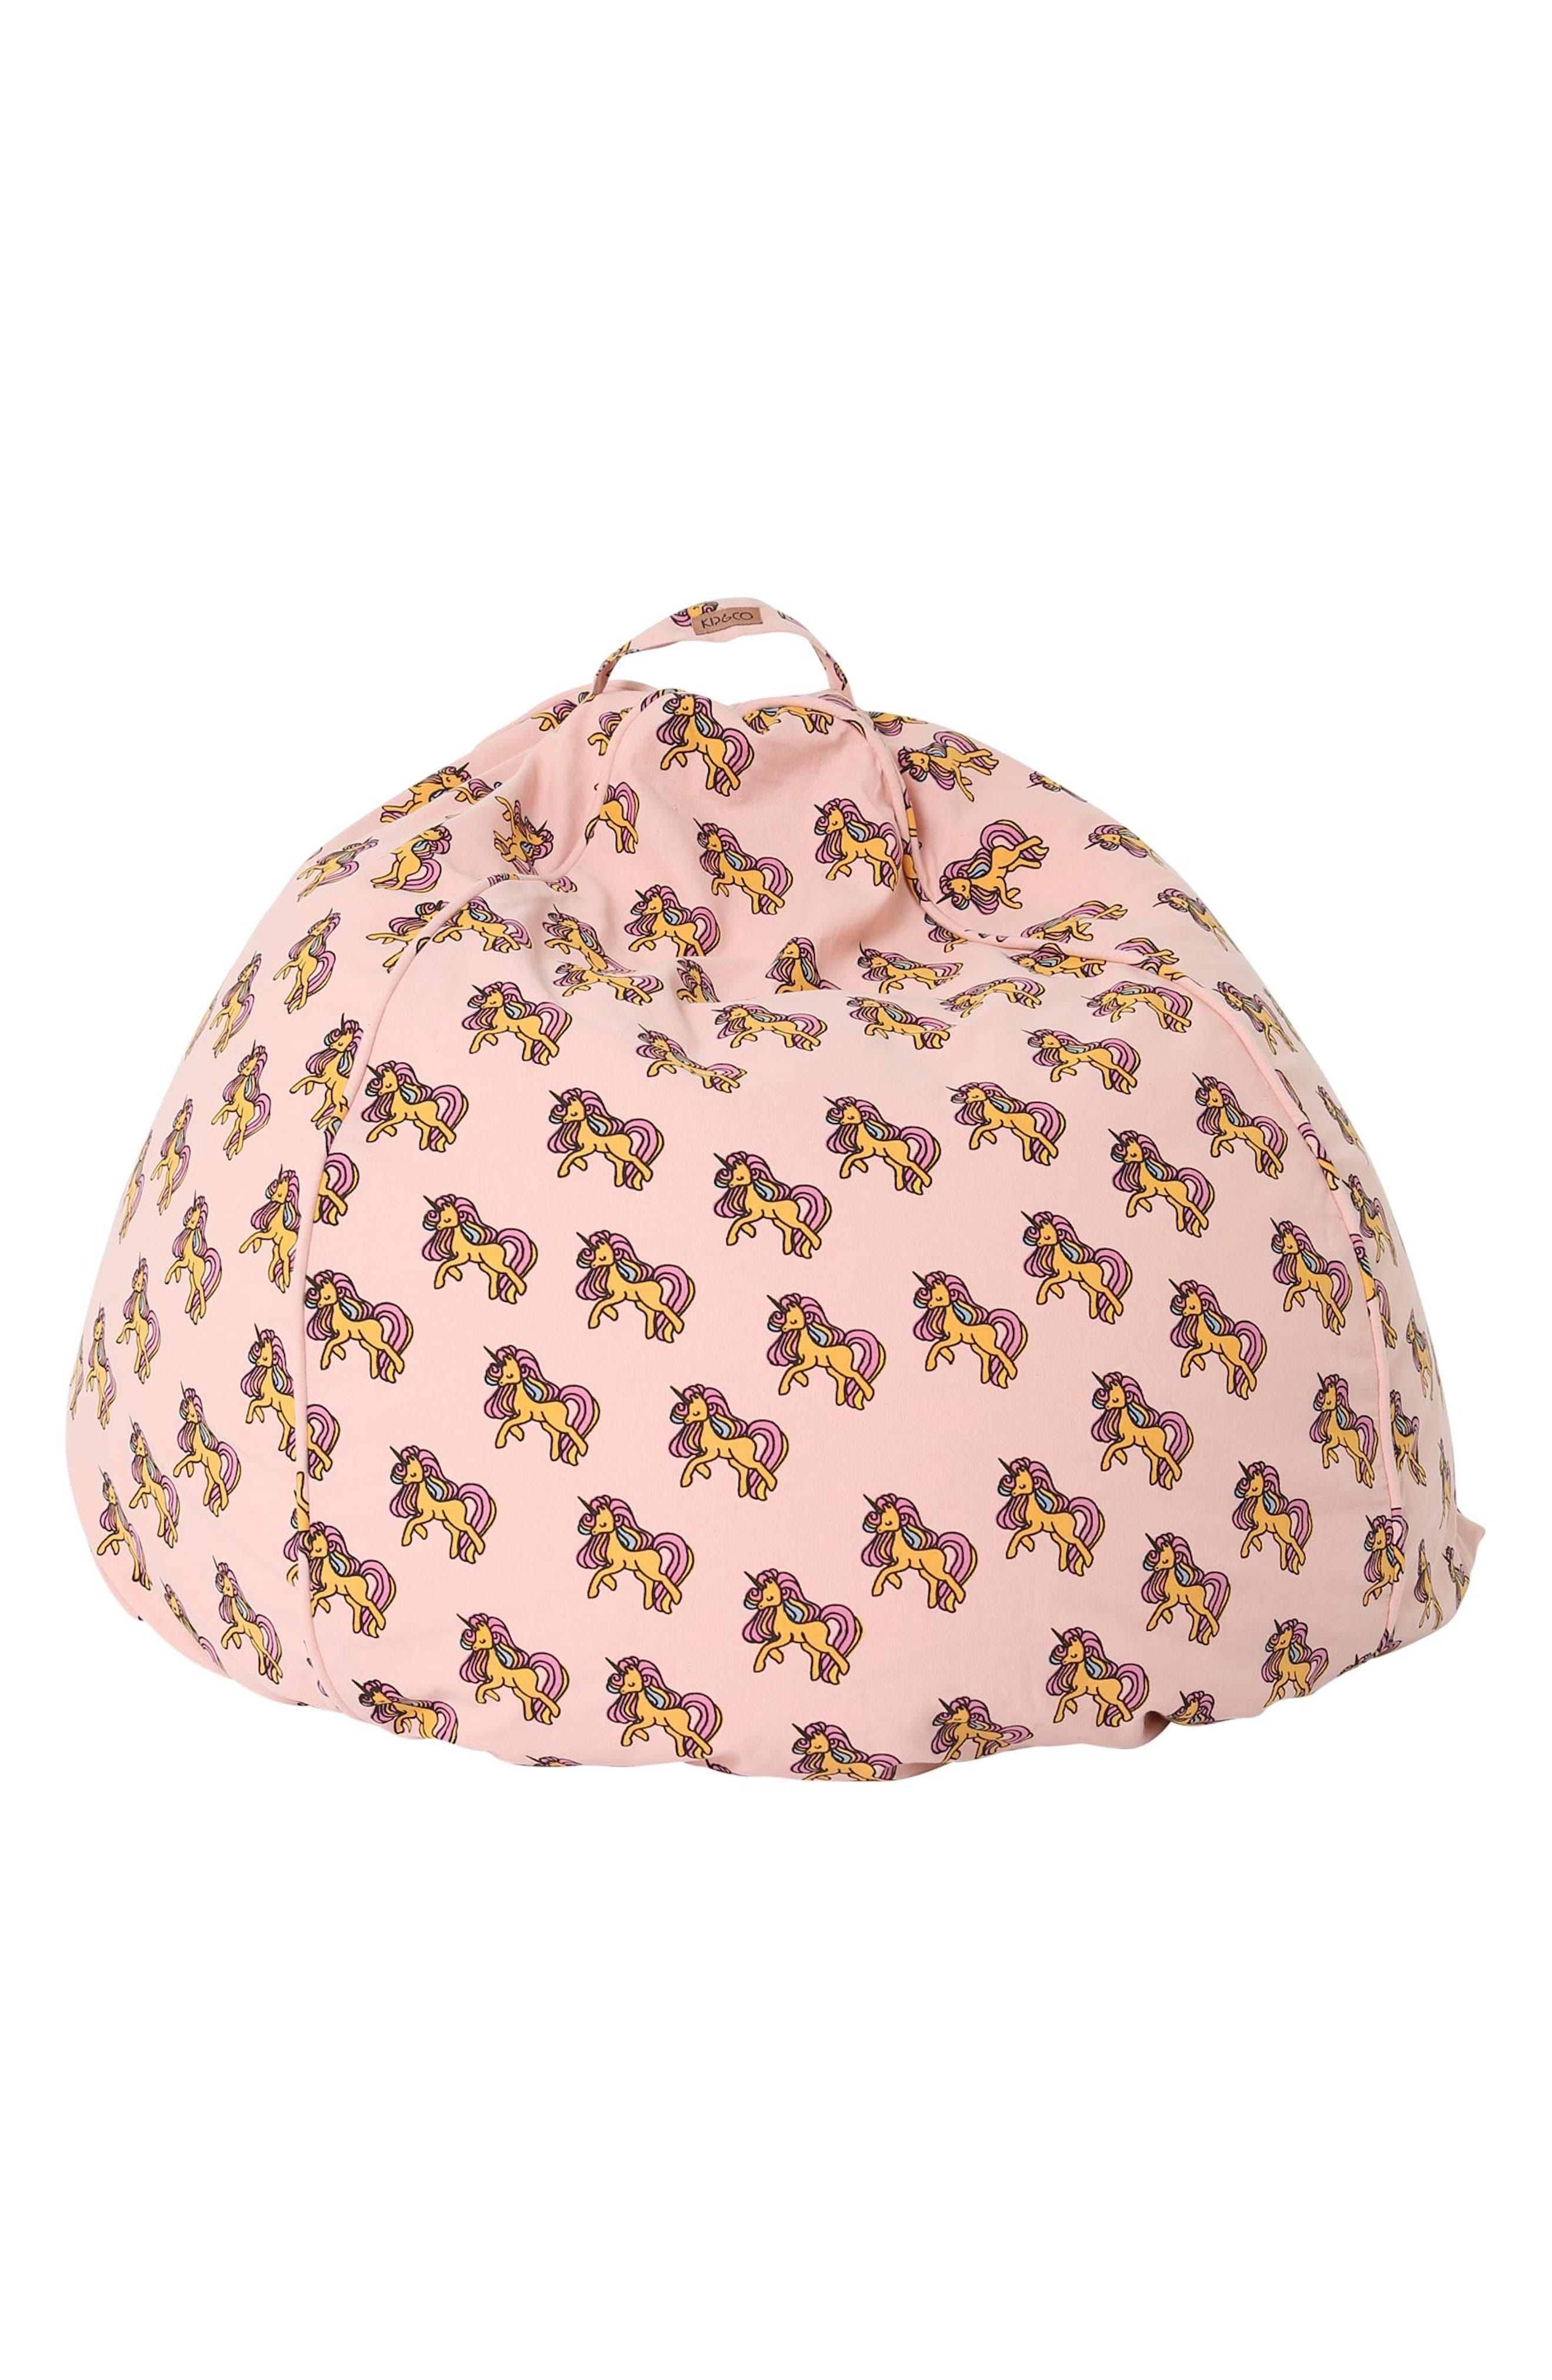 Unicorn Cotton Canvas Beanbag Cover,                             Main thumbnail 1, color,                             MULTI